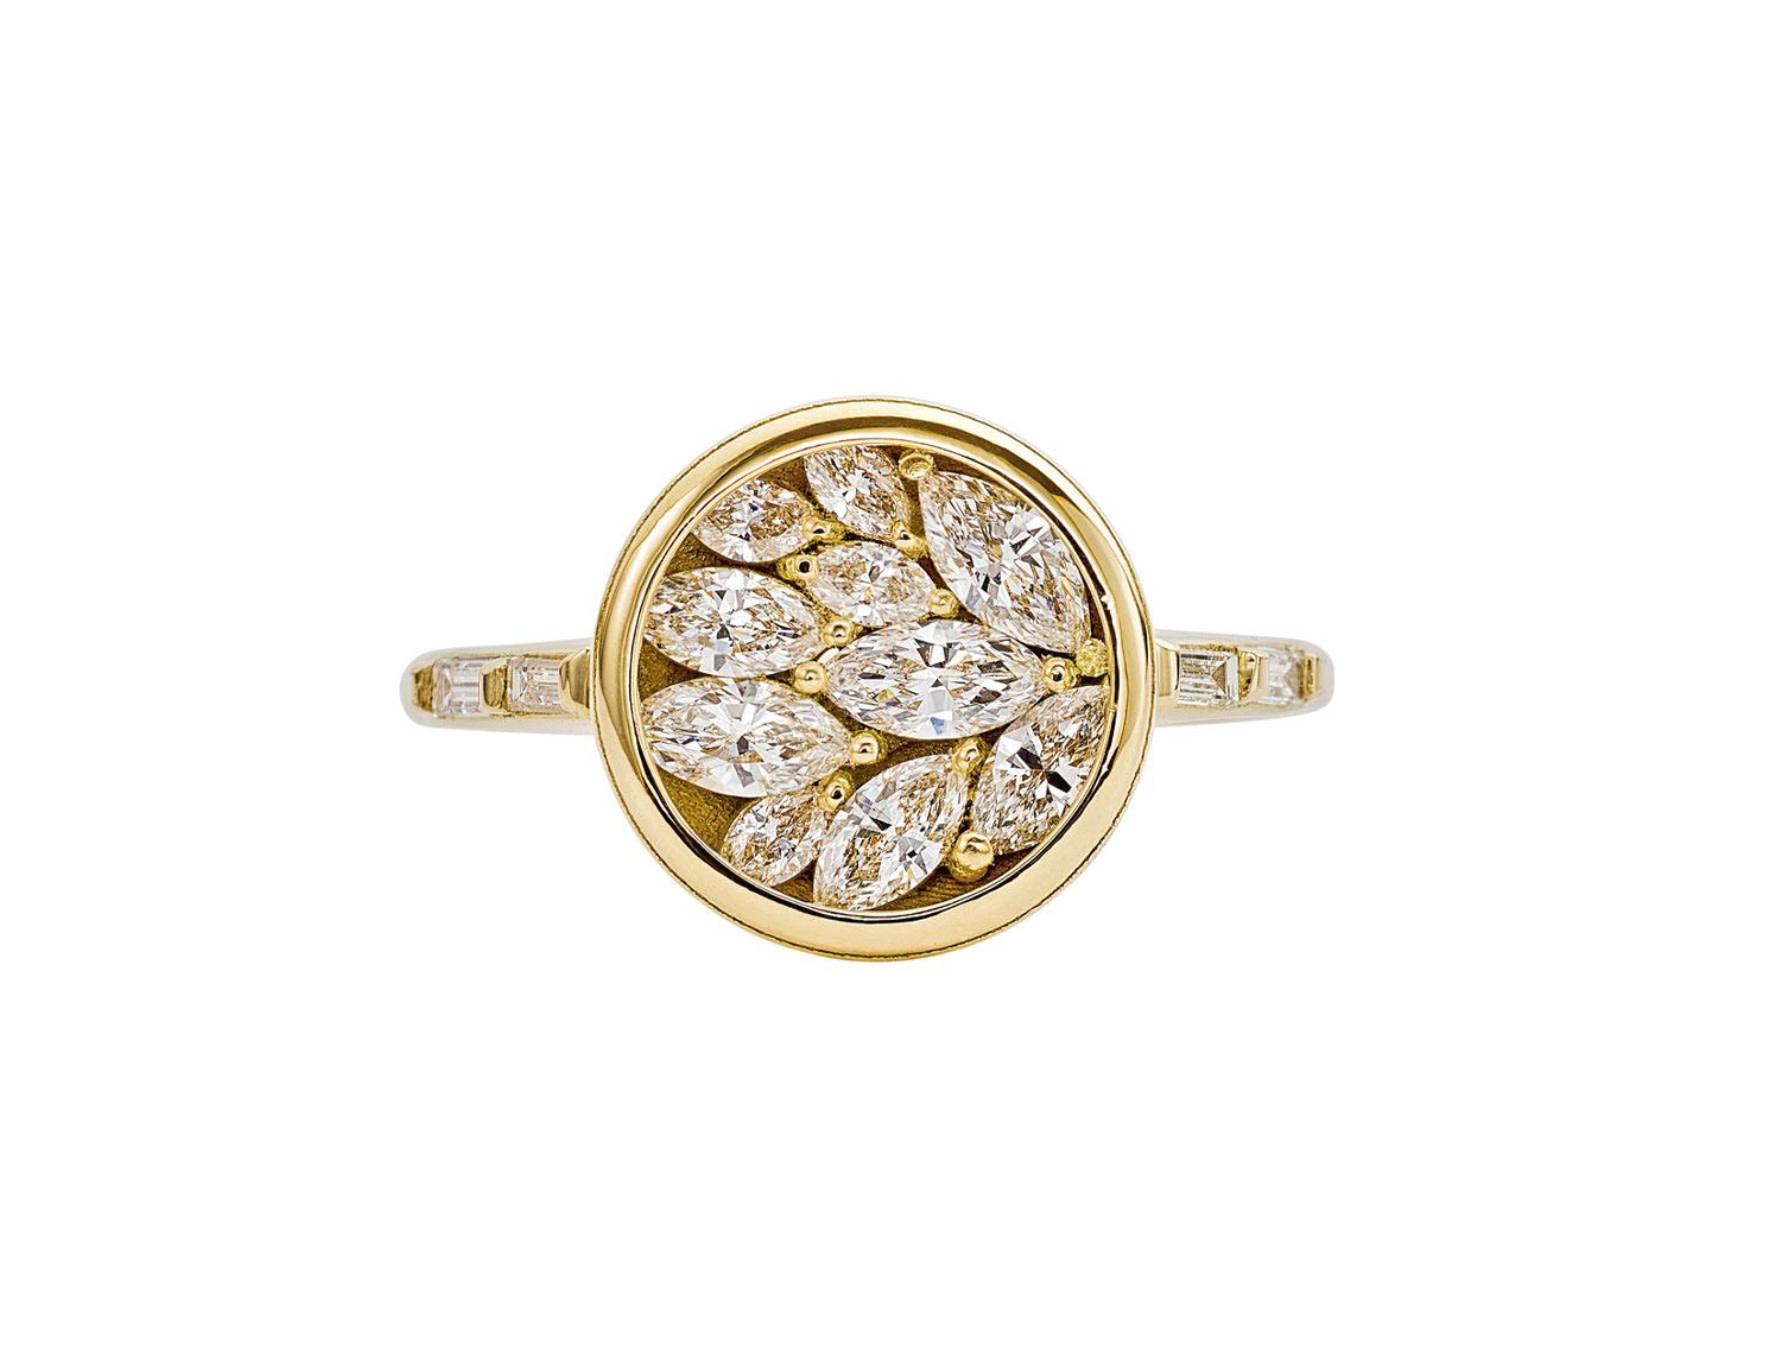 Artëmer Cluster Marquise Diamond Petal Ring